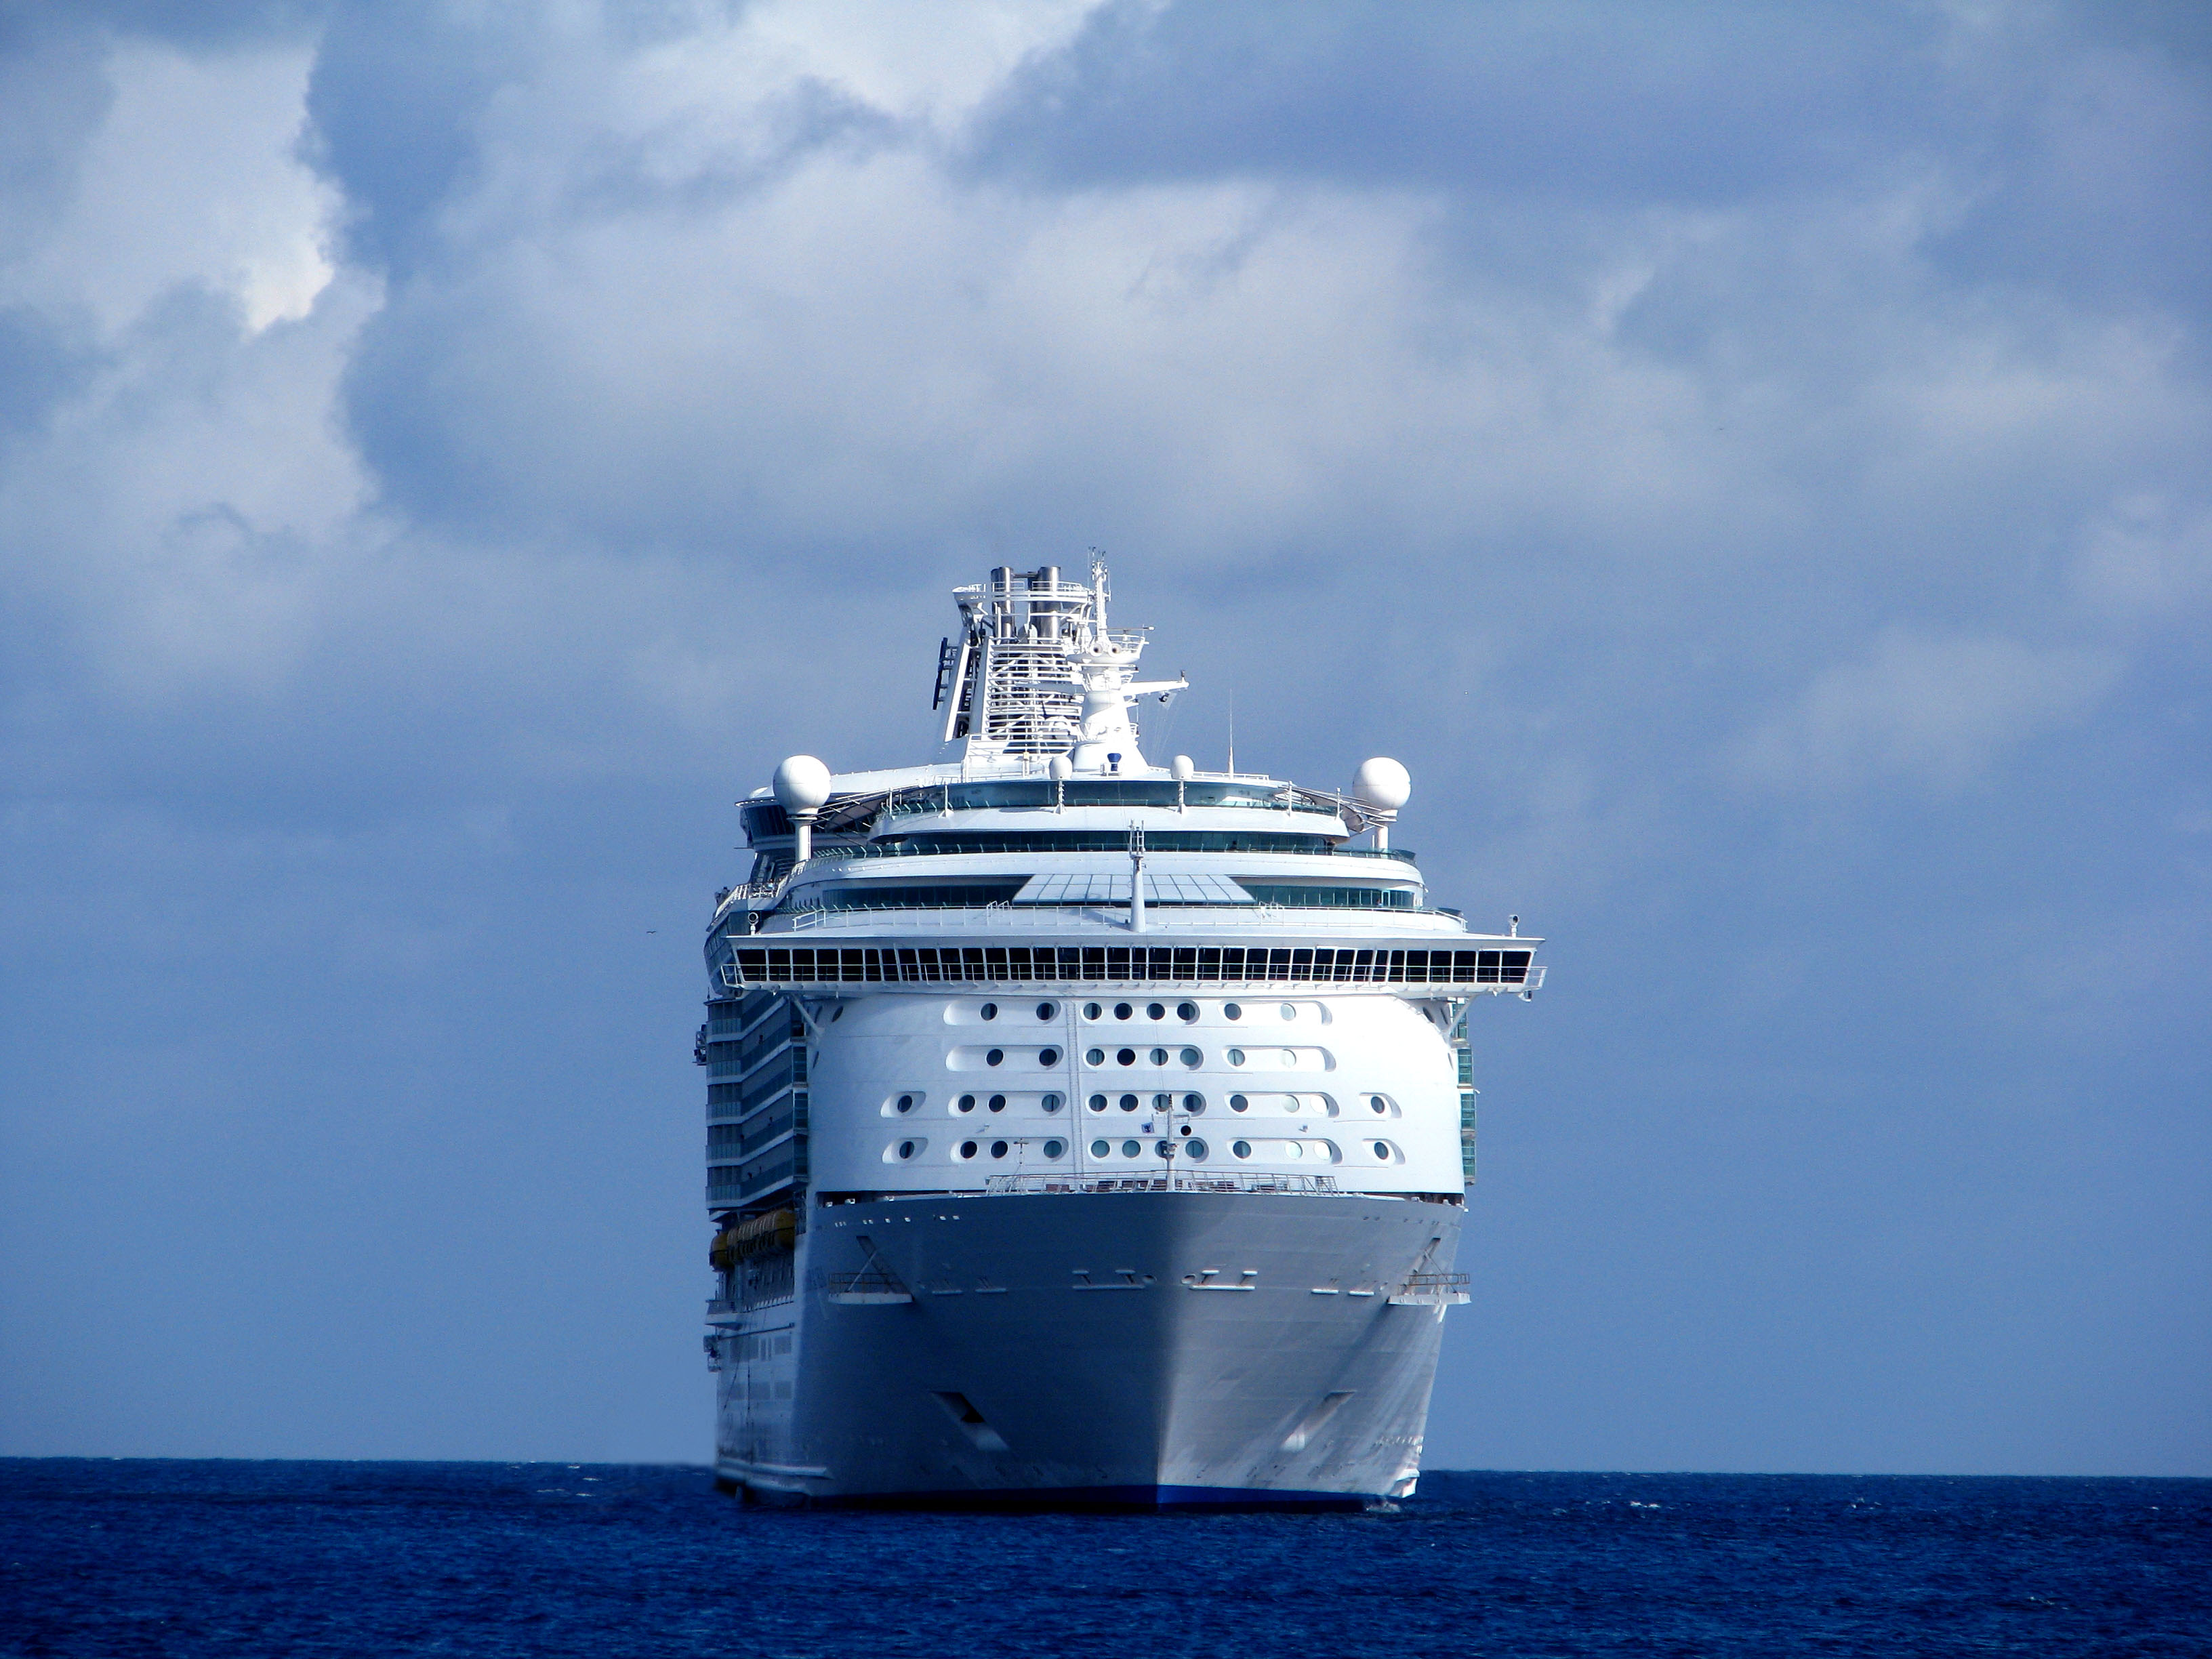 File:MS Mariner of the Seas.jpg - Wikimedia Commons